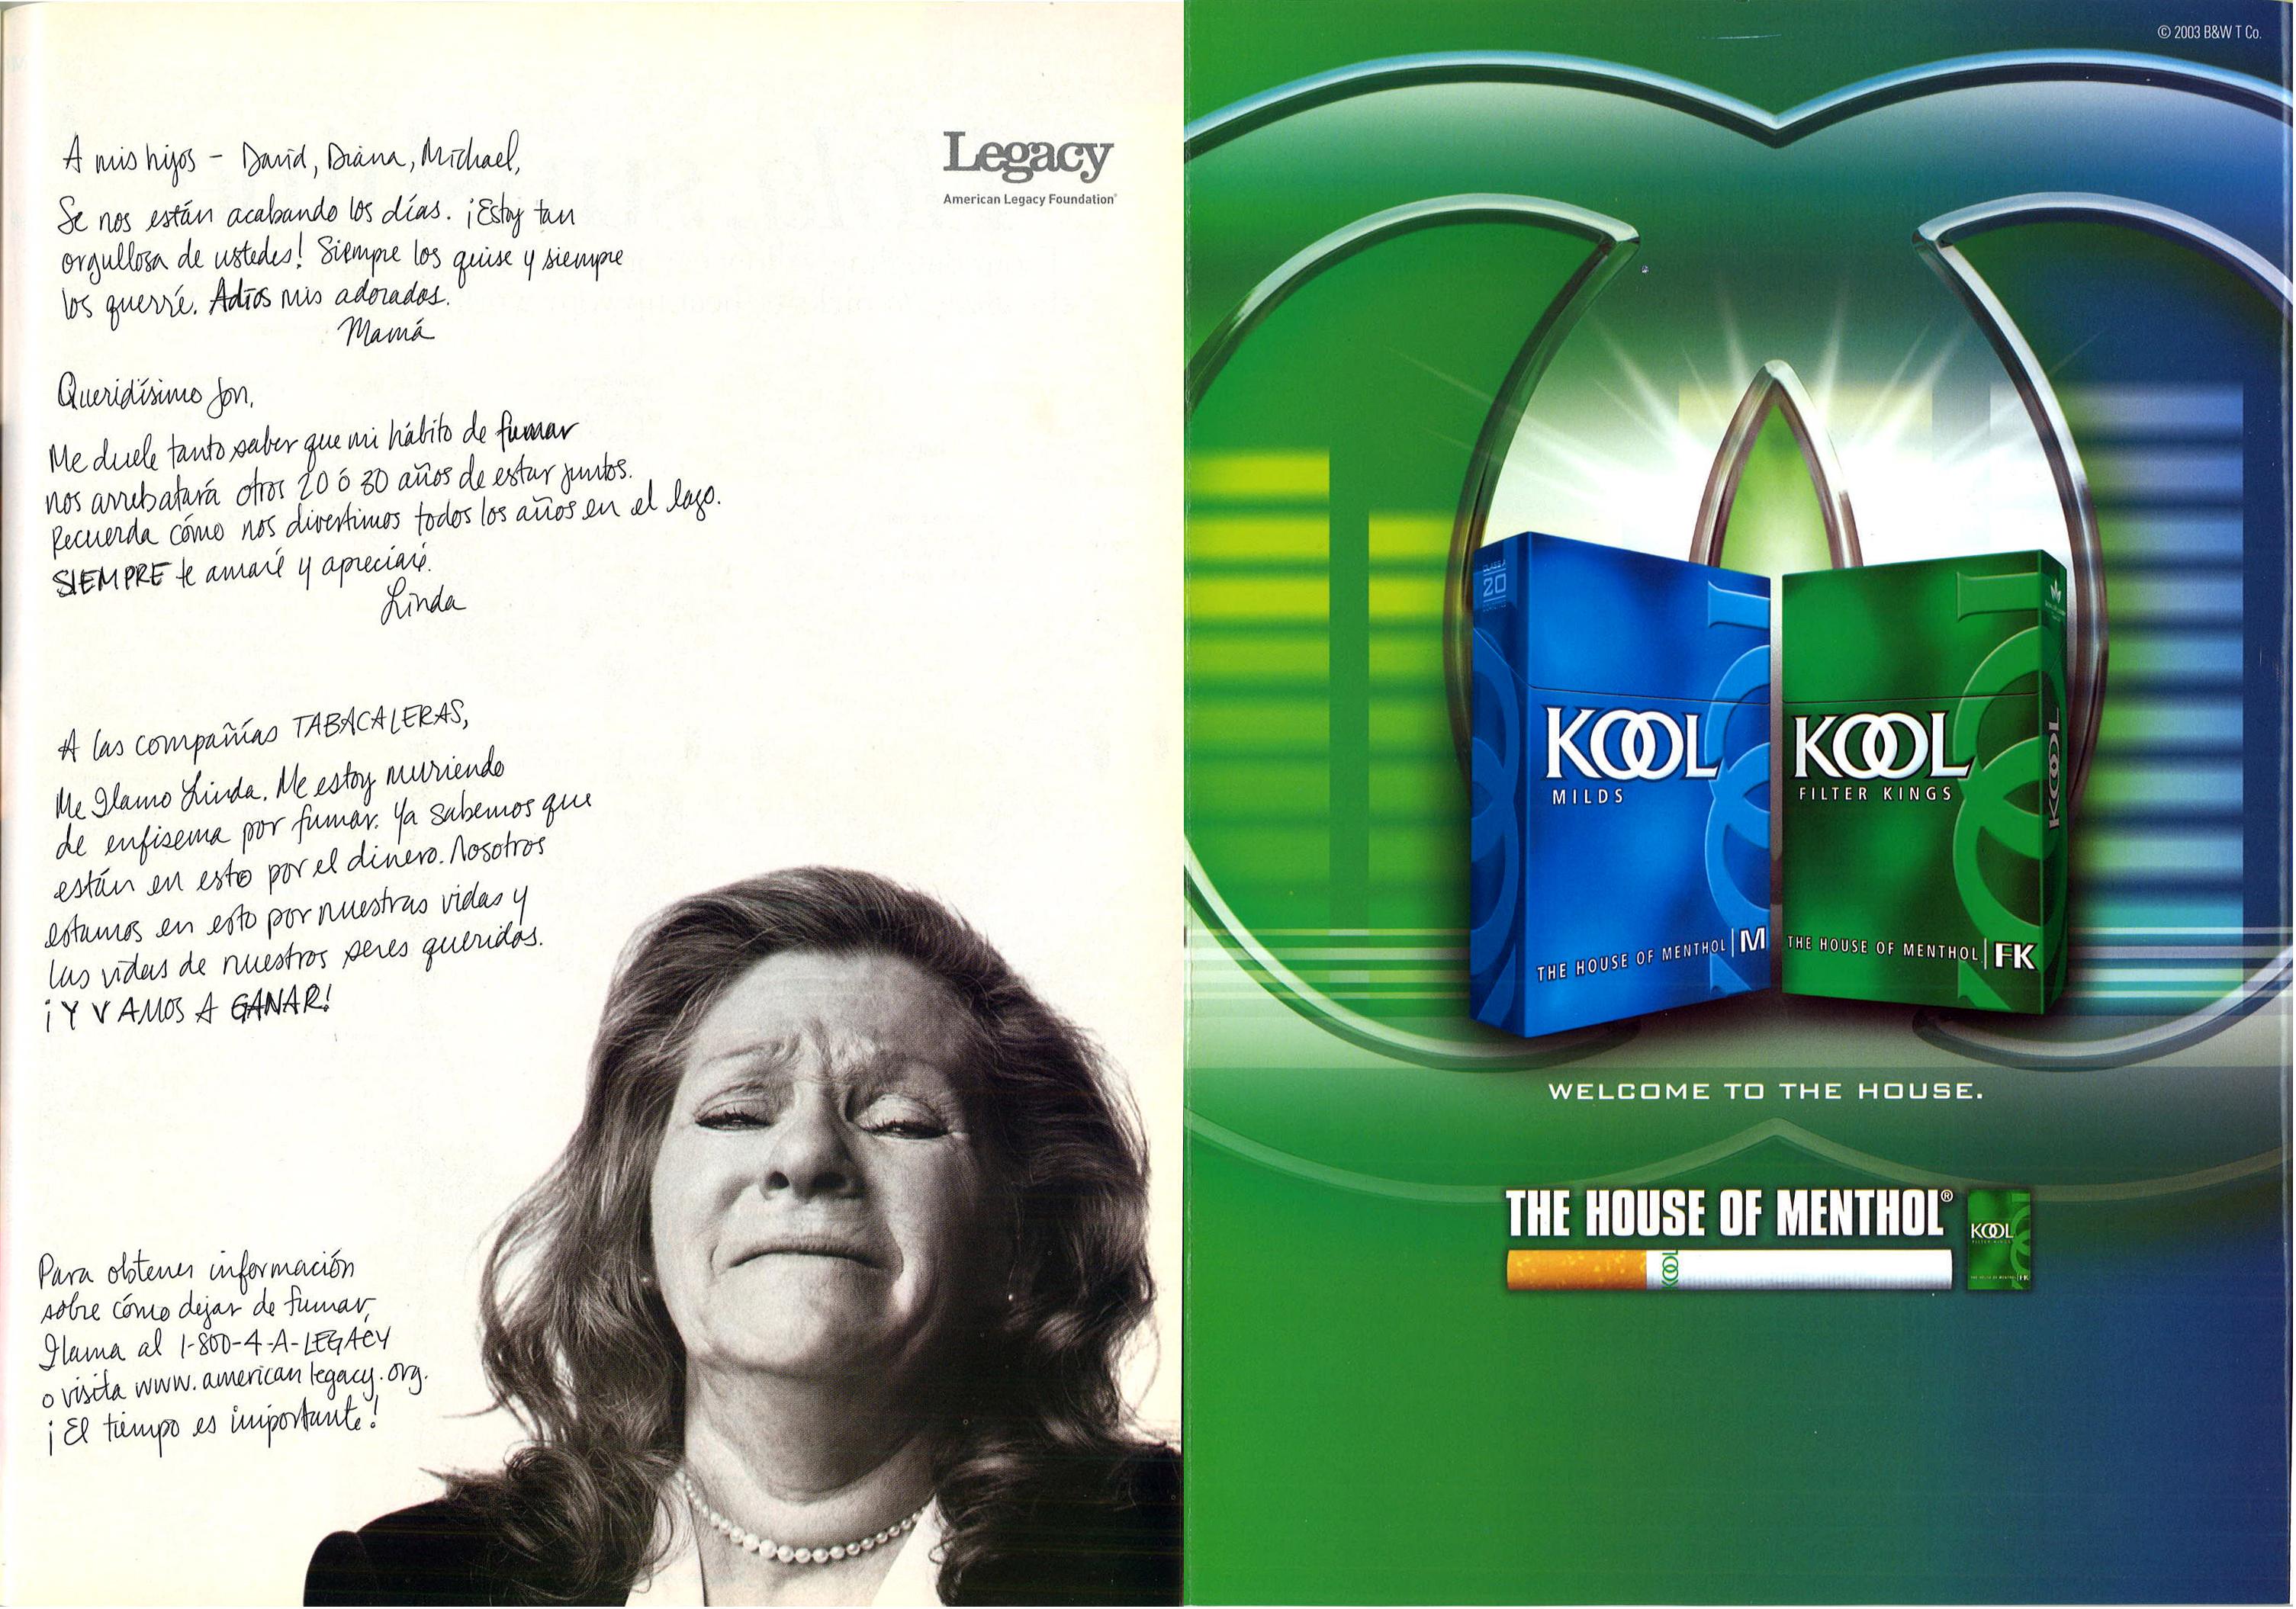 2003 06 Latina American Legacy Foundation Ad Kool Ad